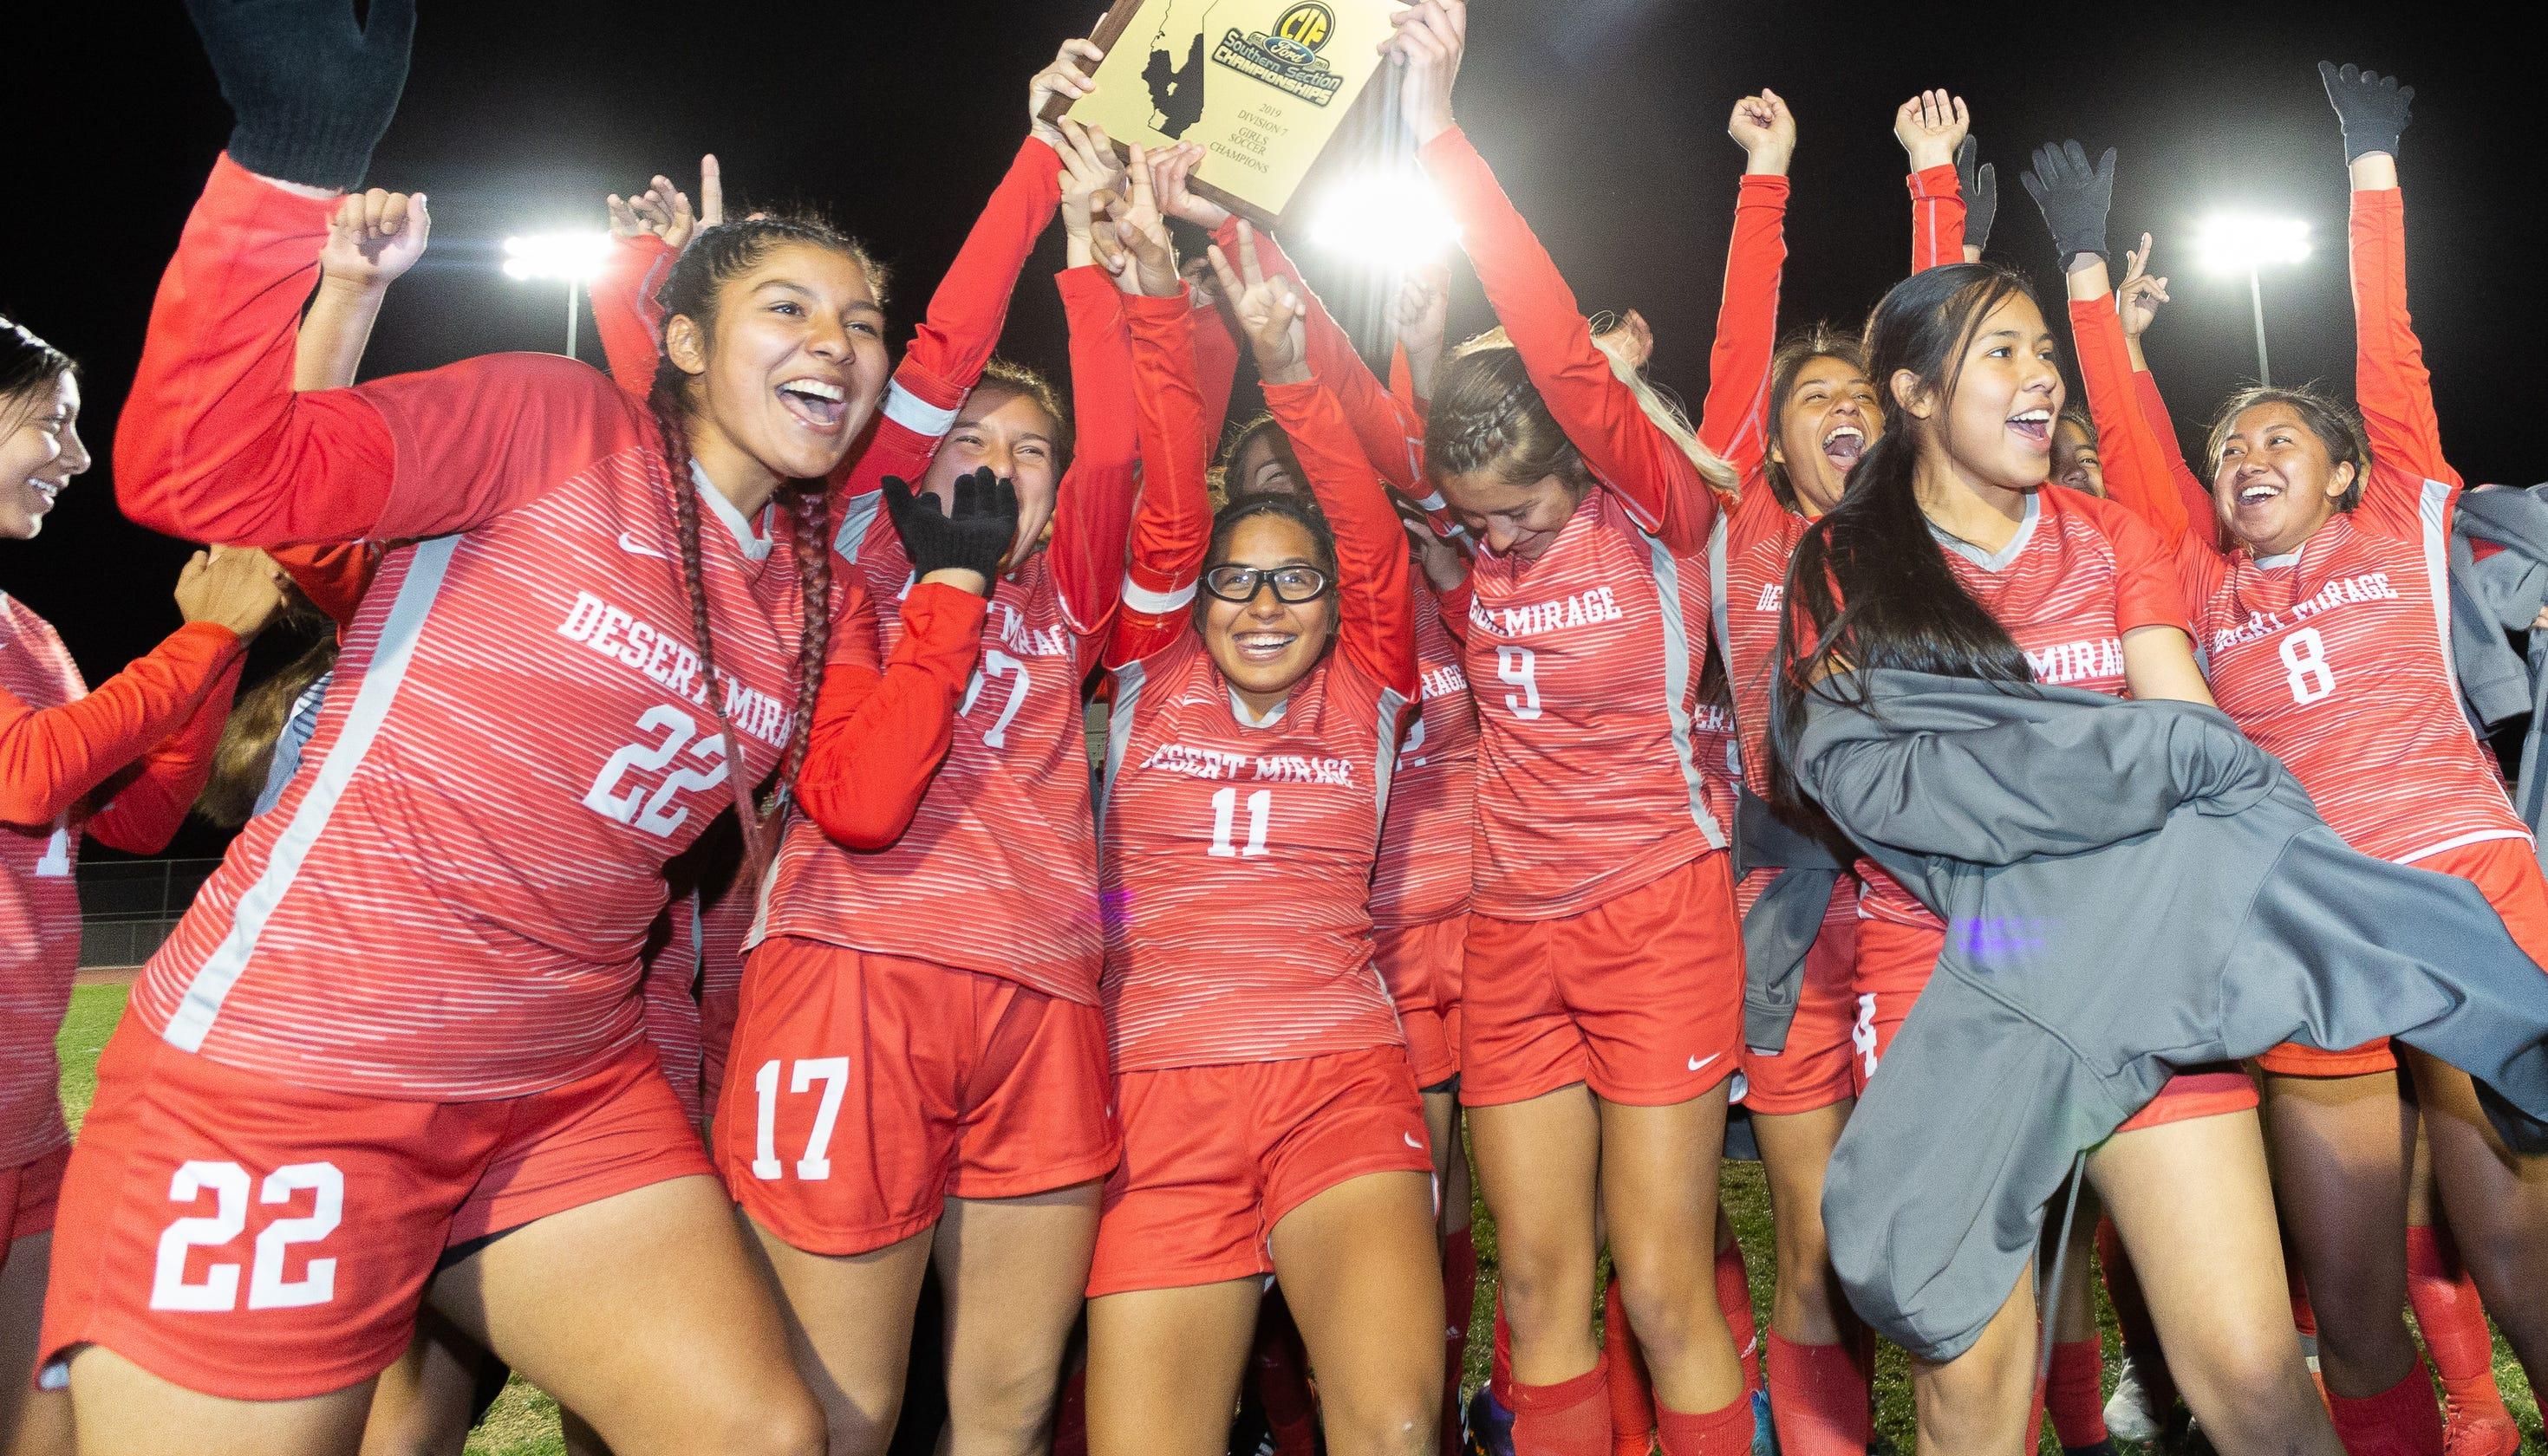 dd9b2248eb Desert Mirage wins first girls  soccer CIF title in Coachella Valley history